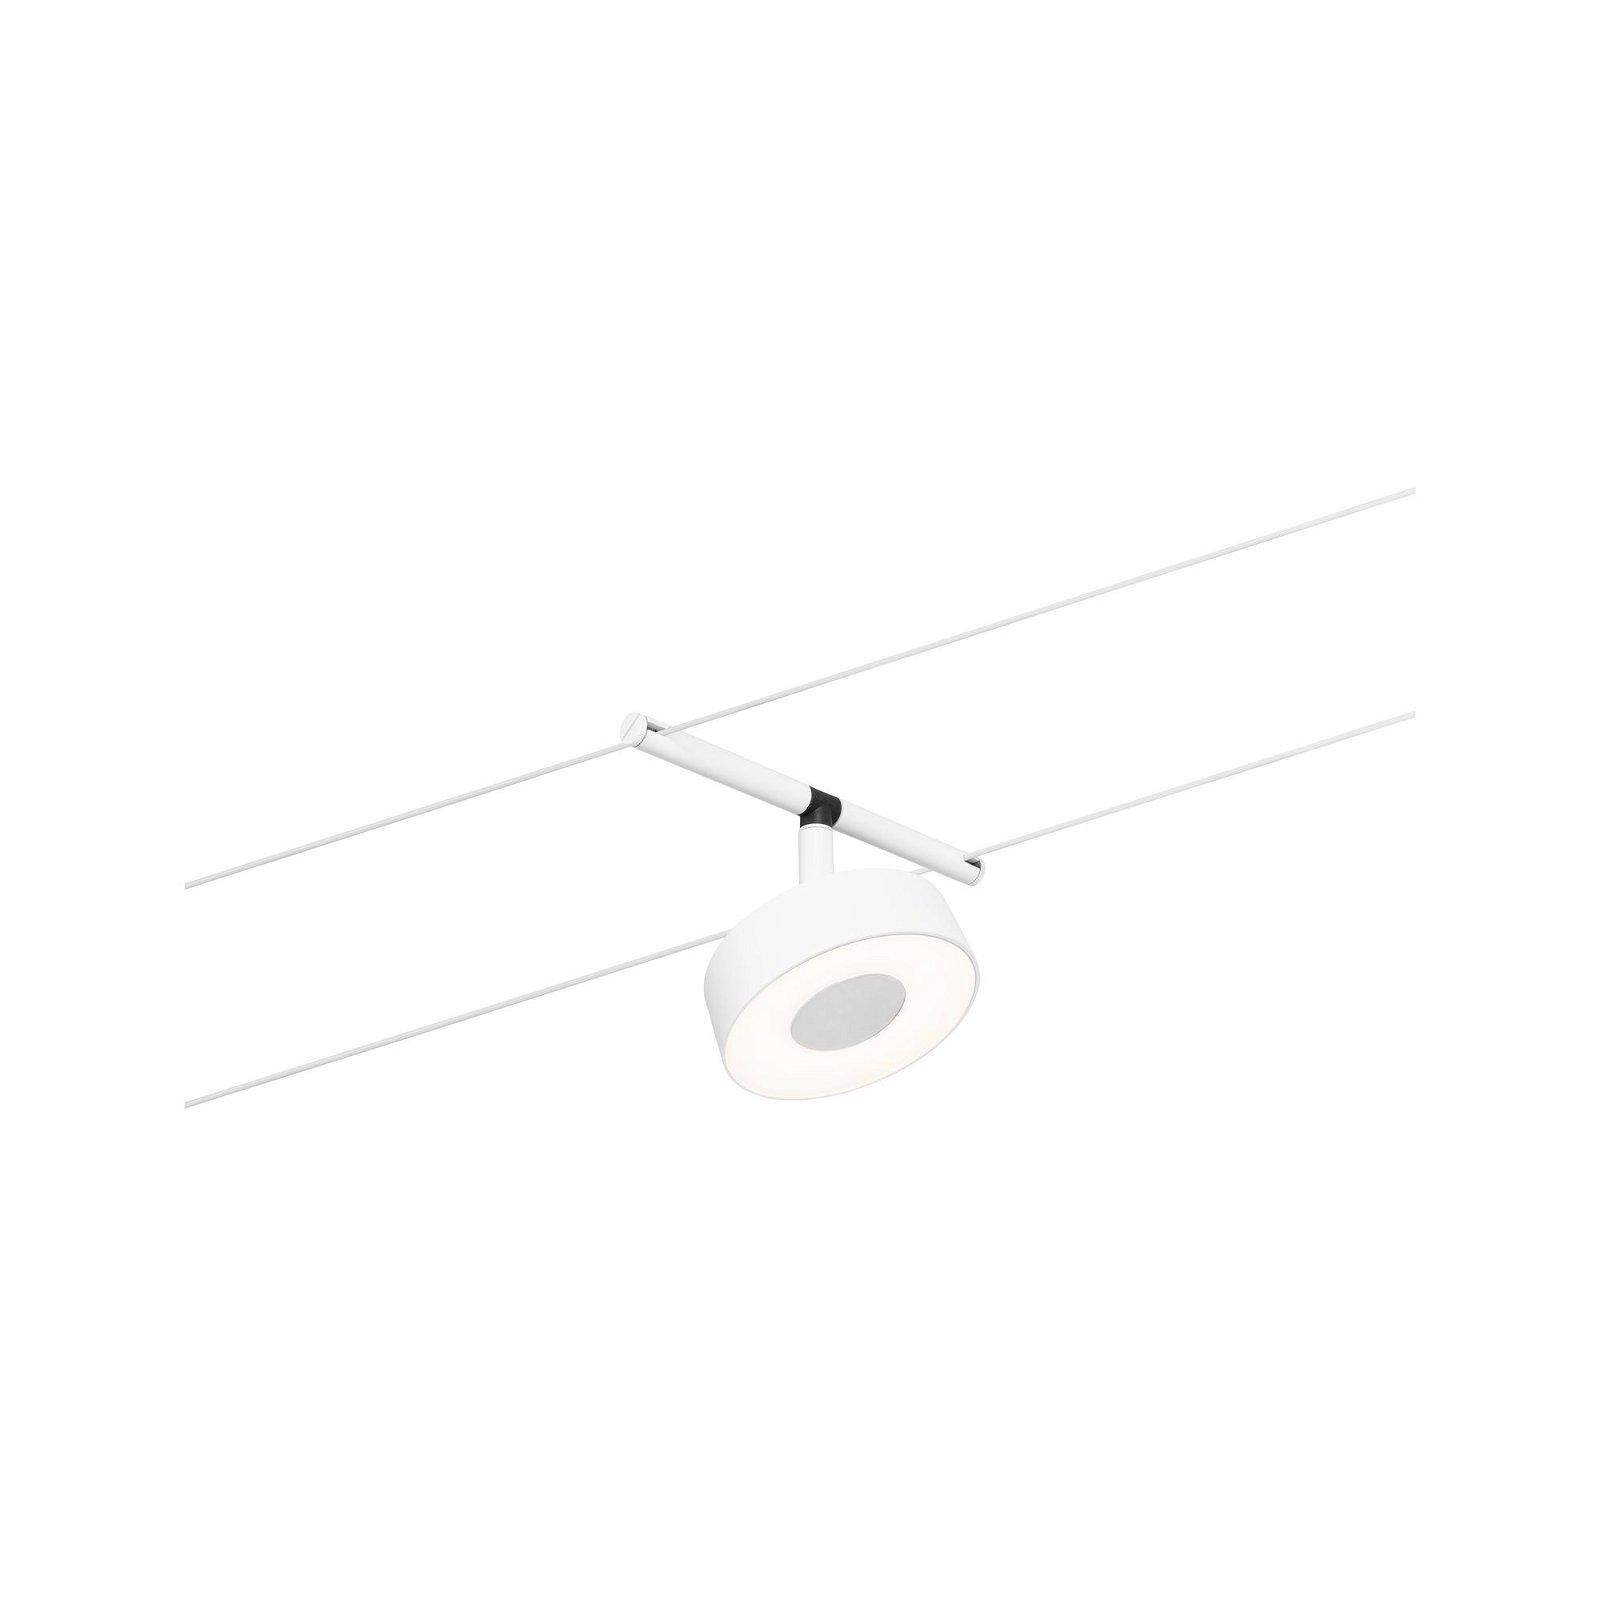 LED Seilsystem Circle Einzelspot 400lm 5W 3000K 12V Weiß matt/Chrom